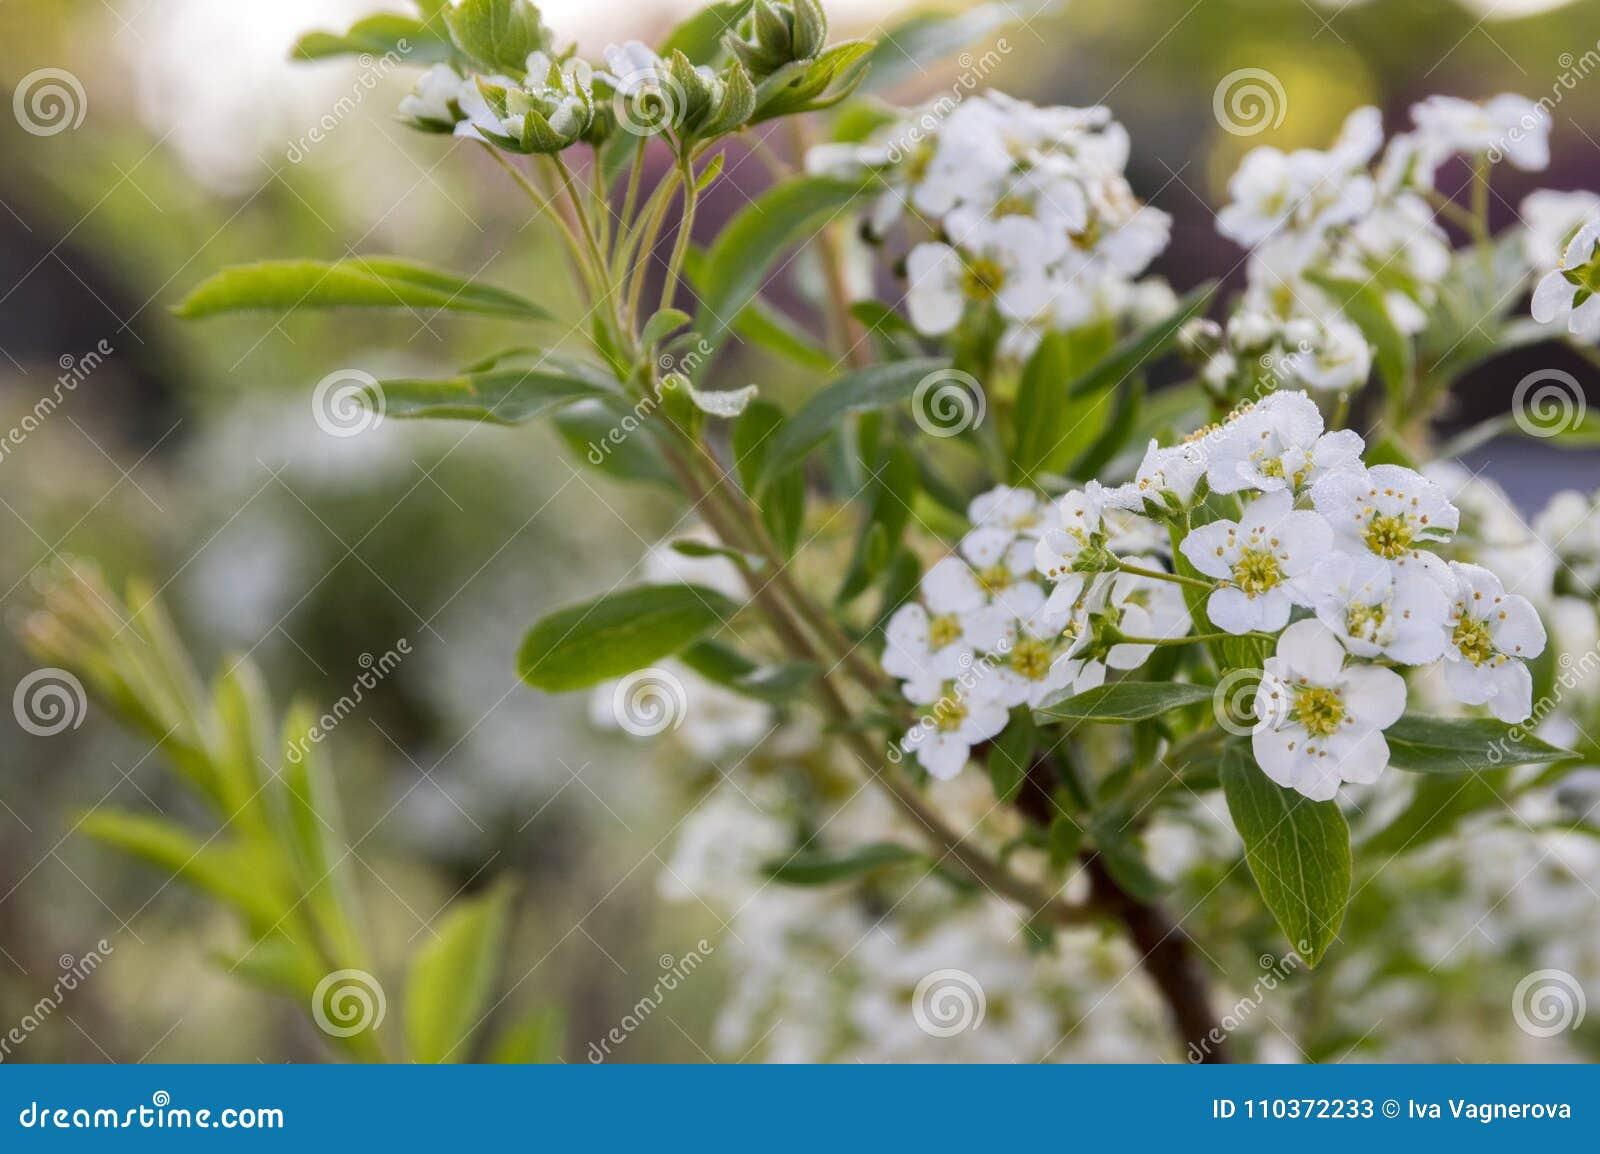 Spiraea Cinerea In Bloom Gray Grefsheim Shrub With White Flowers In